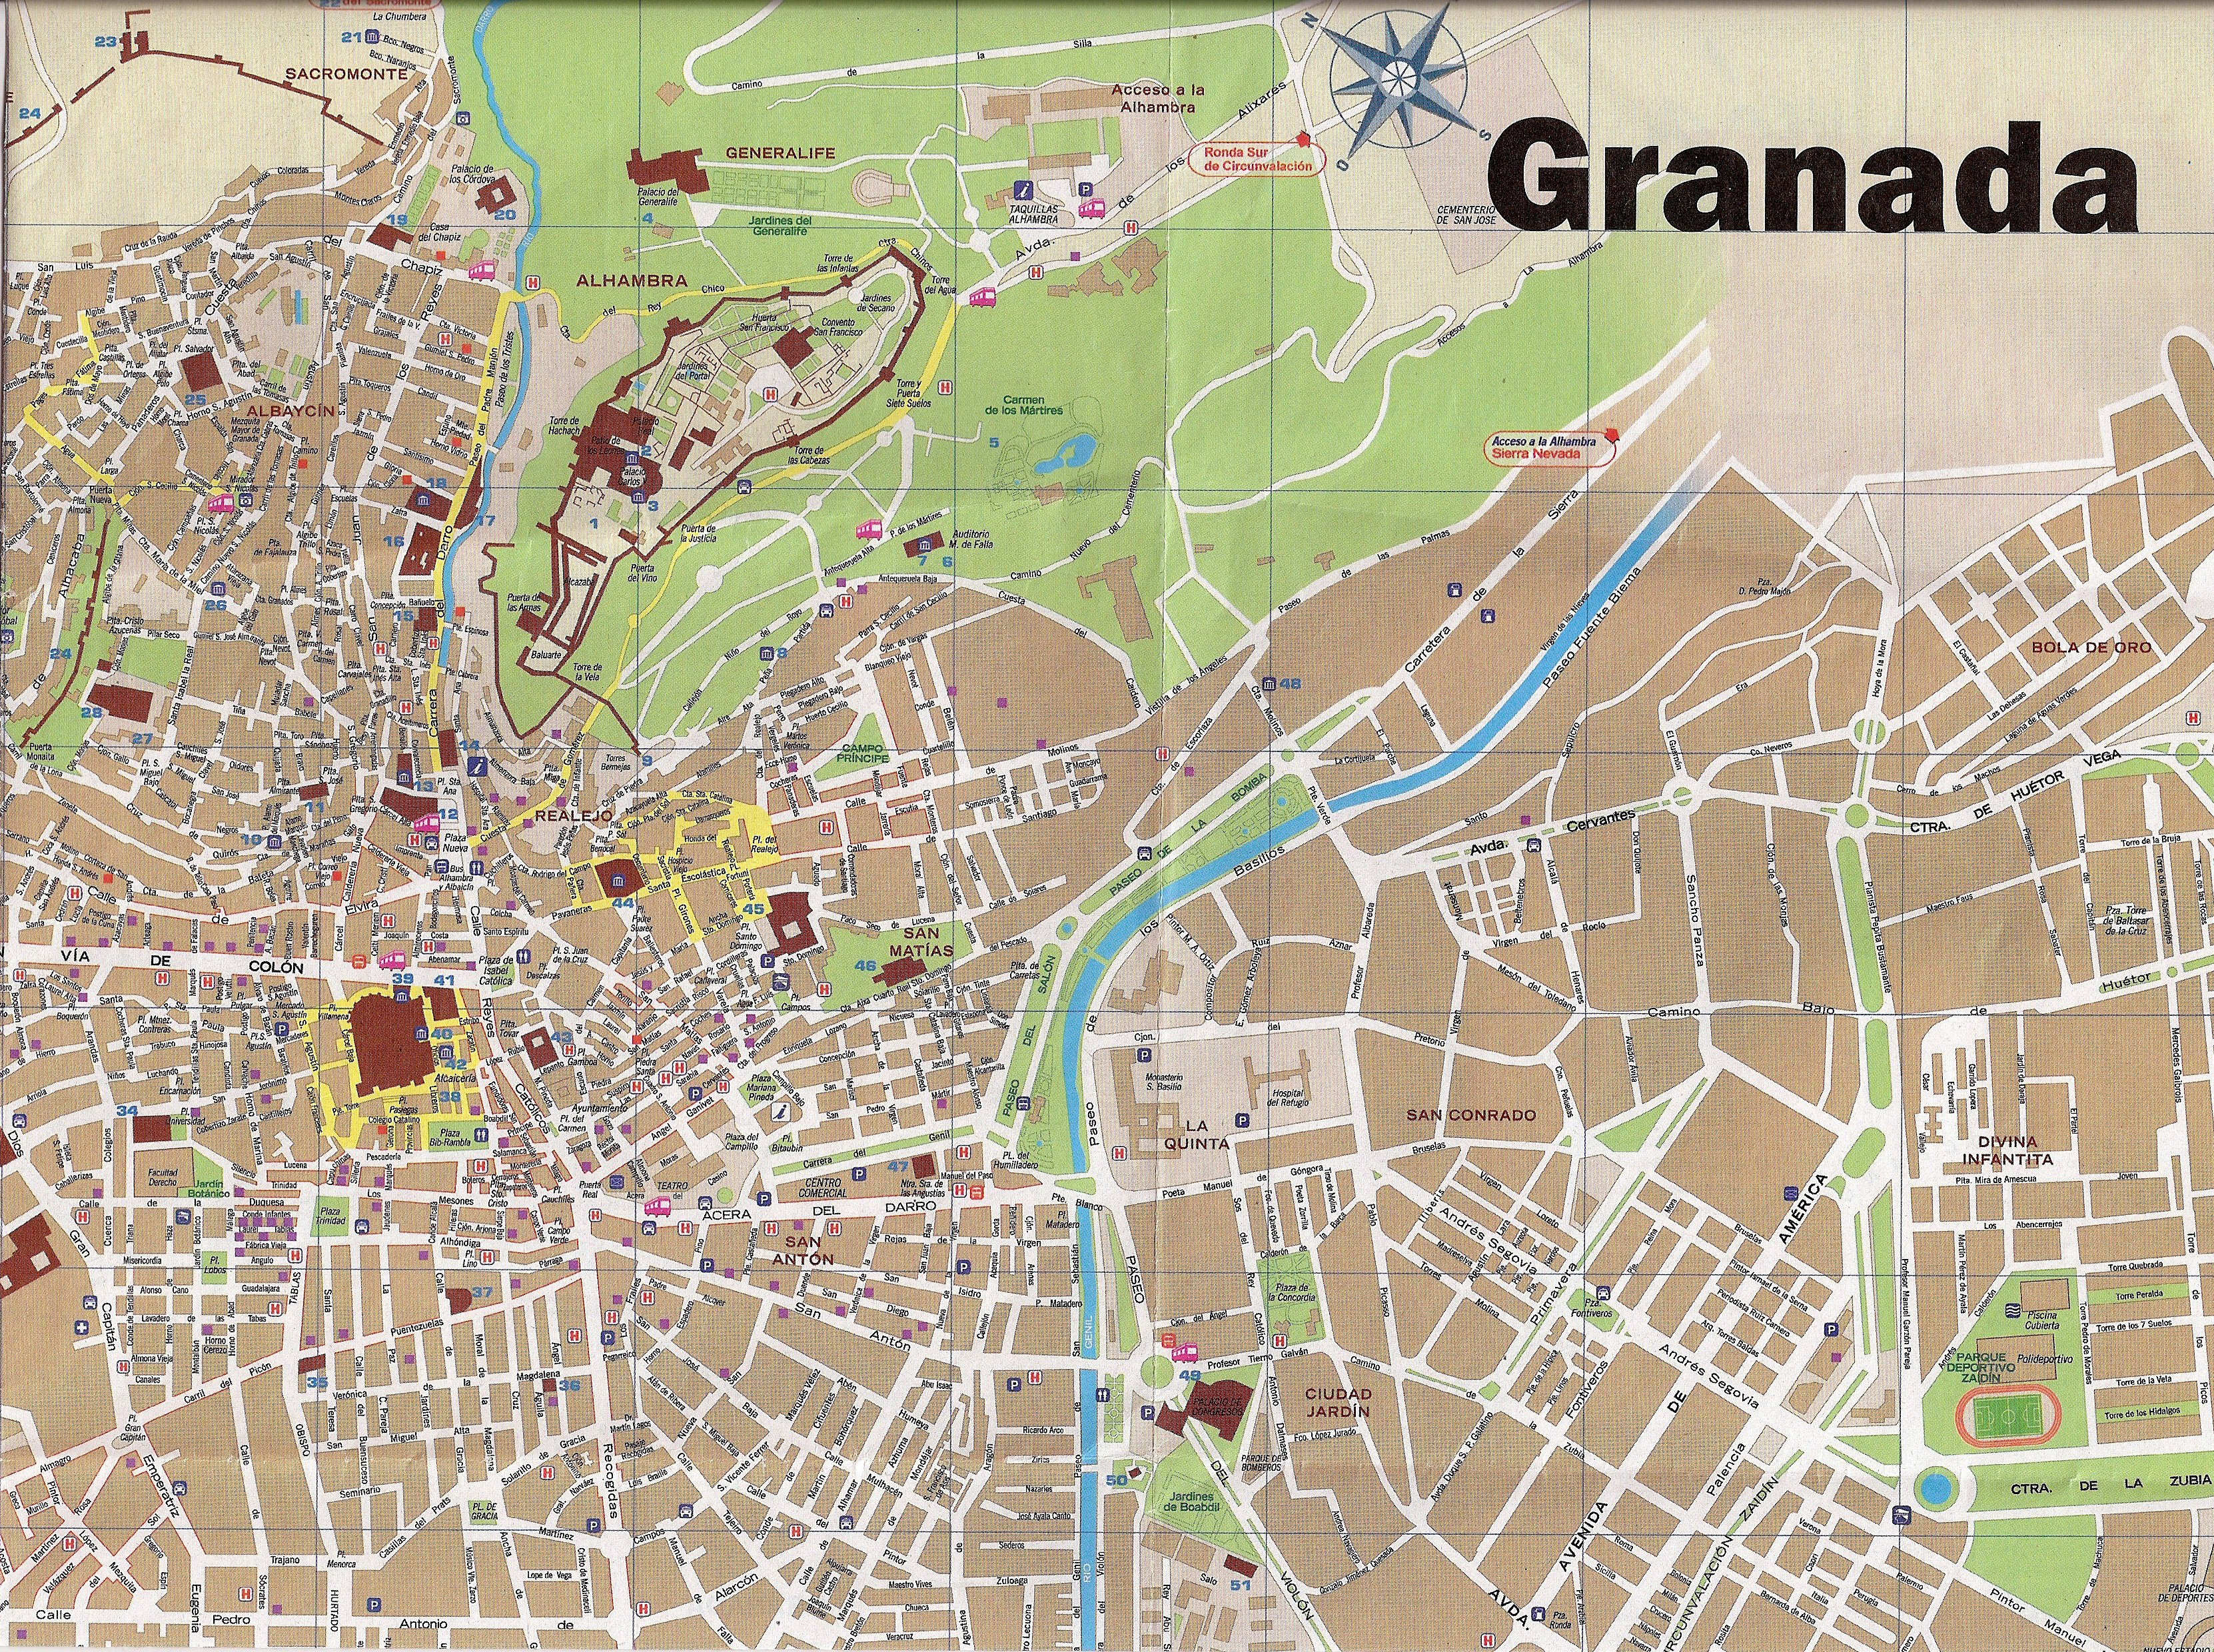 Map Of Spain Granada.Map Of Spain Granada